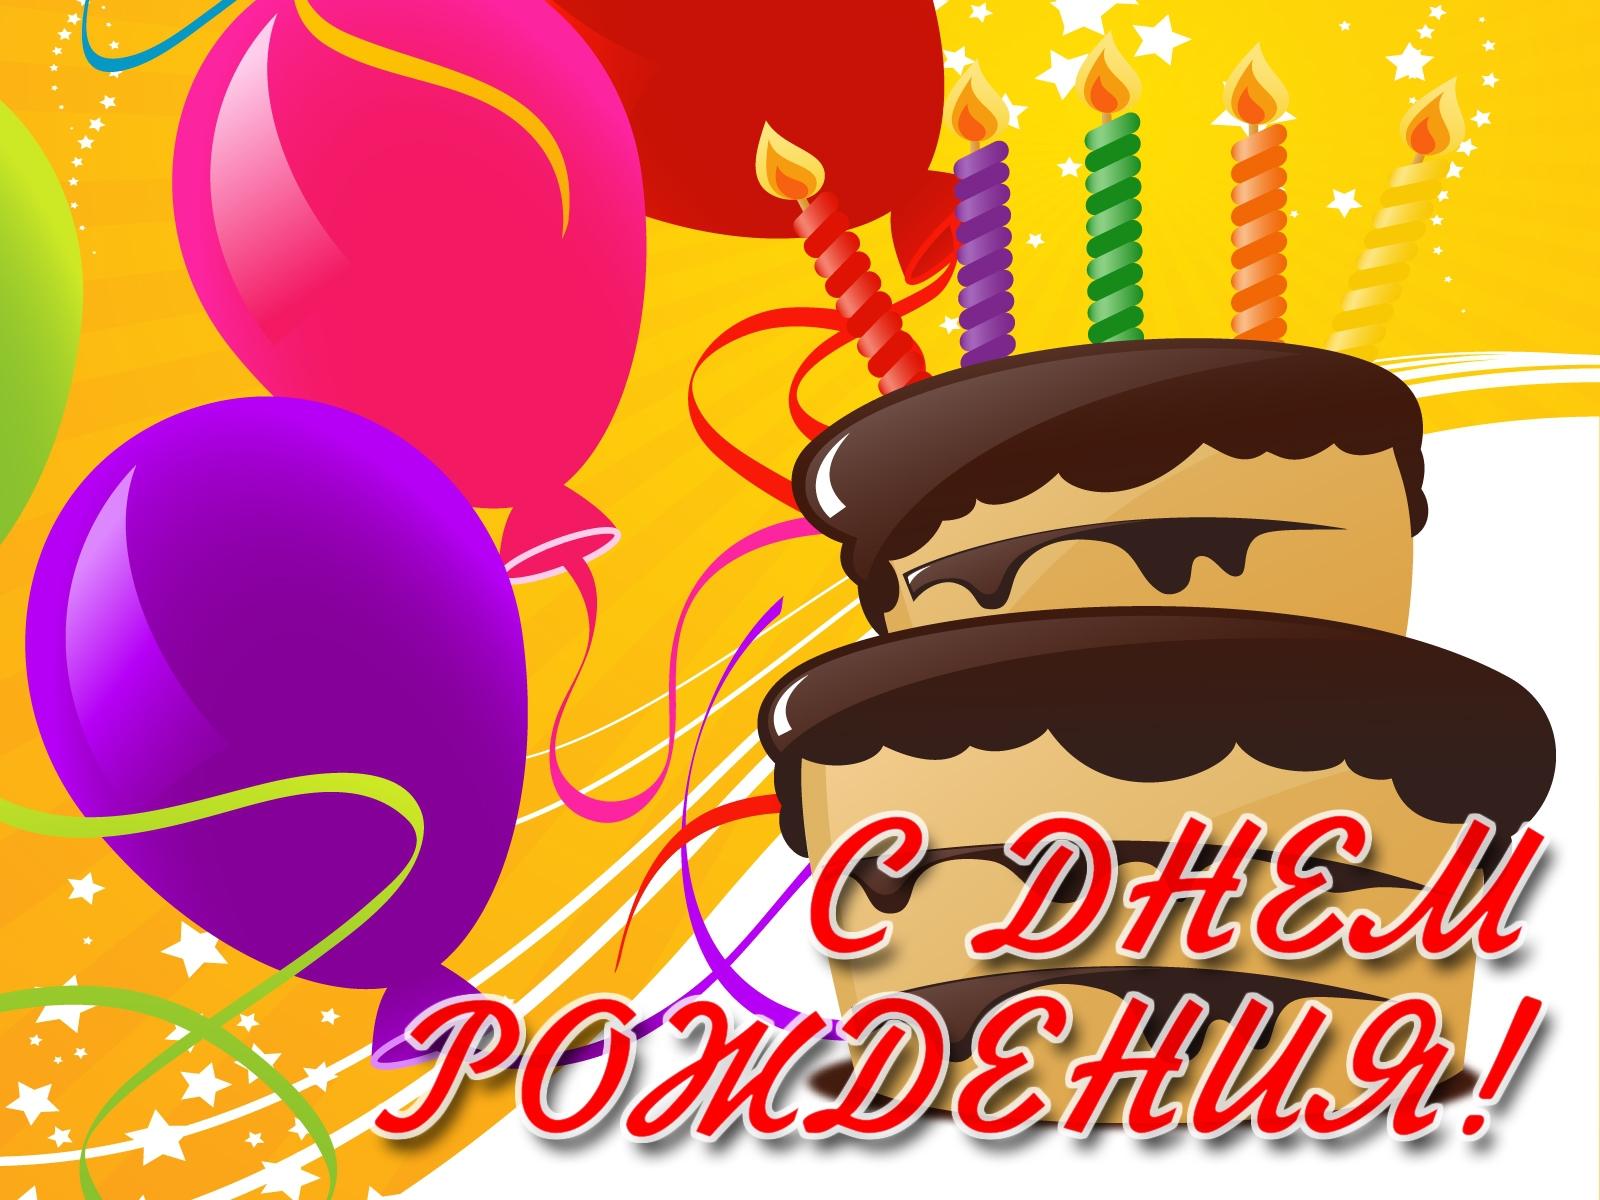 http://www.zastavki.com/pictures/originals/2013/Holidays___Birthday_Cake_with_balloons_on_birthday_051772_.jpg